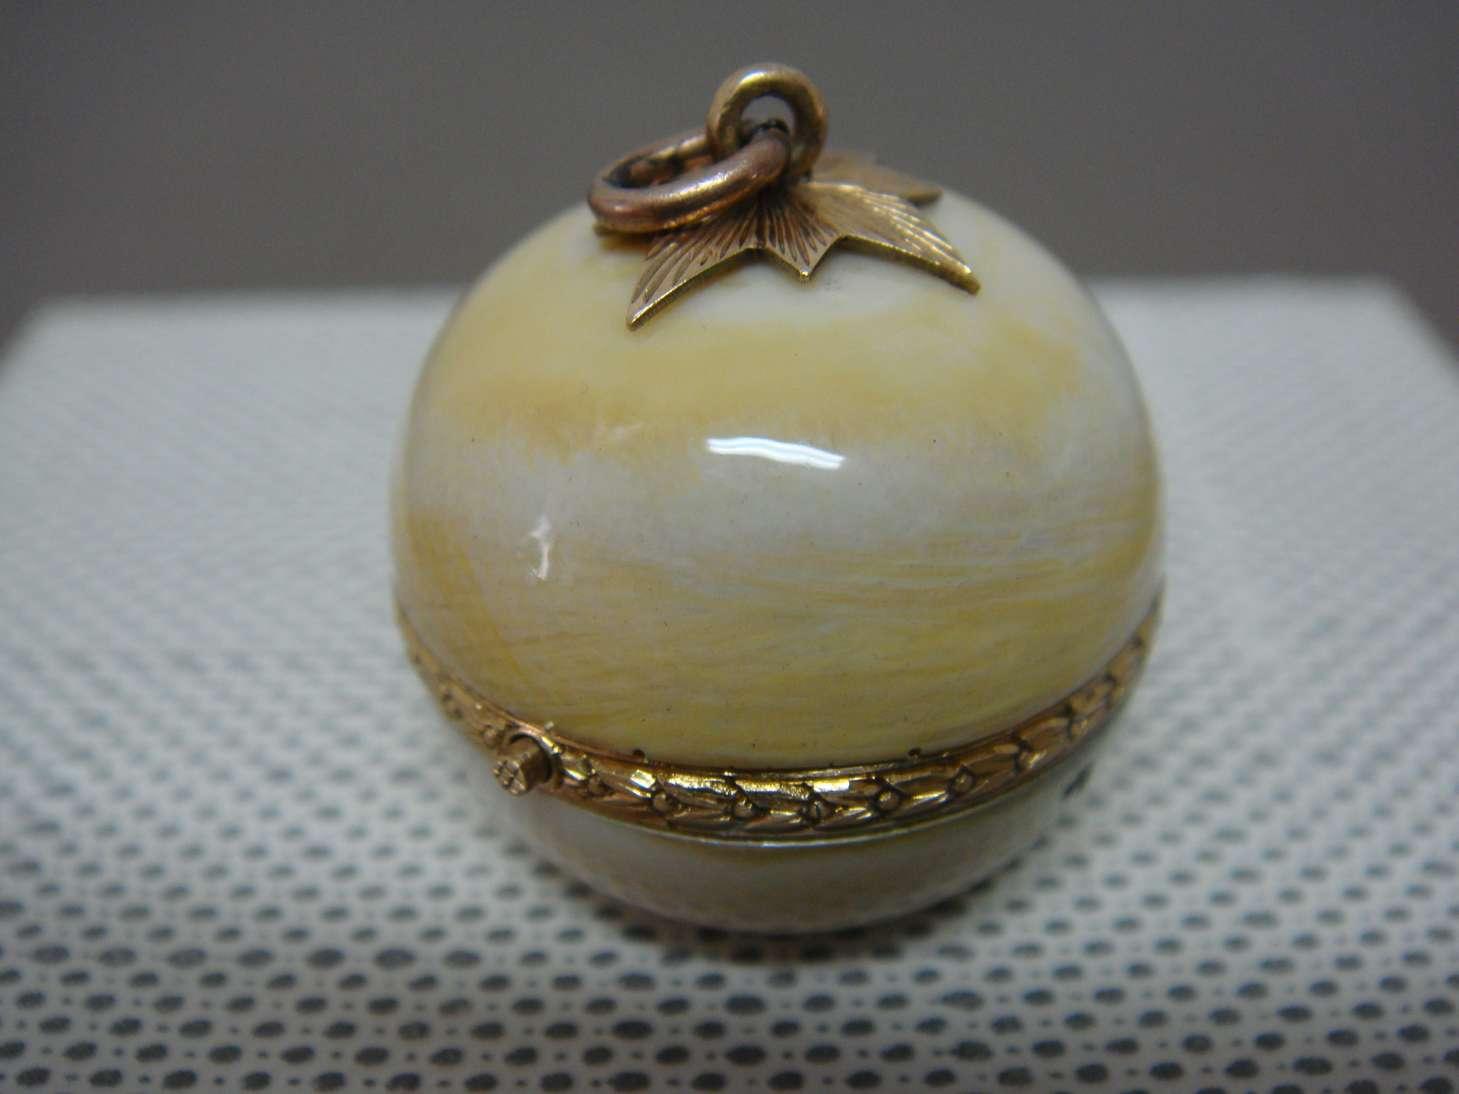 boule-geneve-montre-luxe-ivoire-horlogerie-cabinotier-art-restauration-restaurarte-comblemen-retouche.jpg